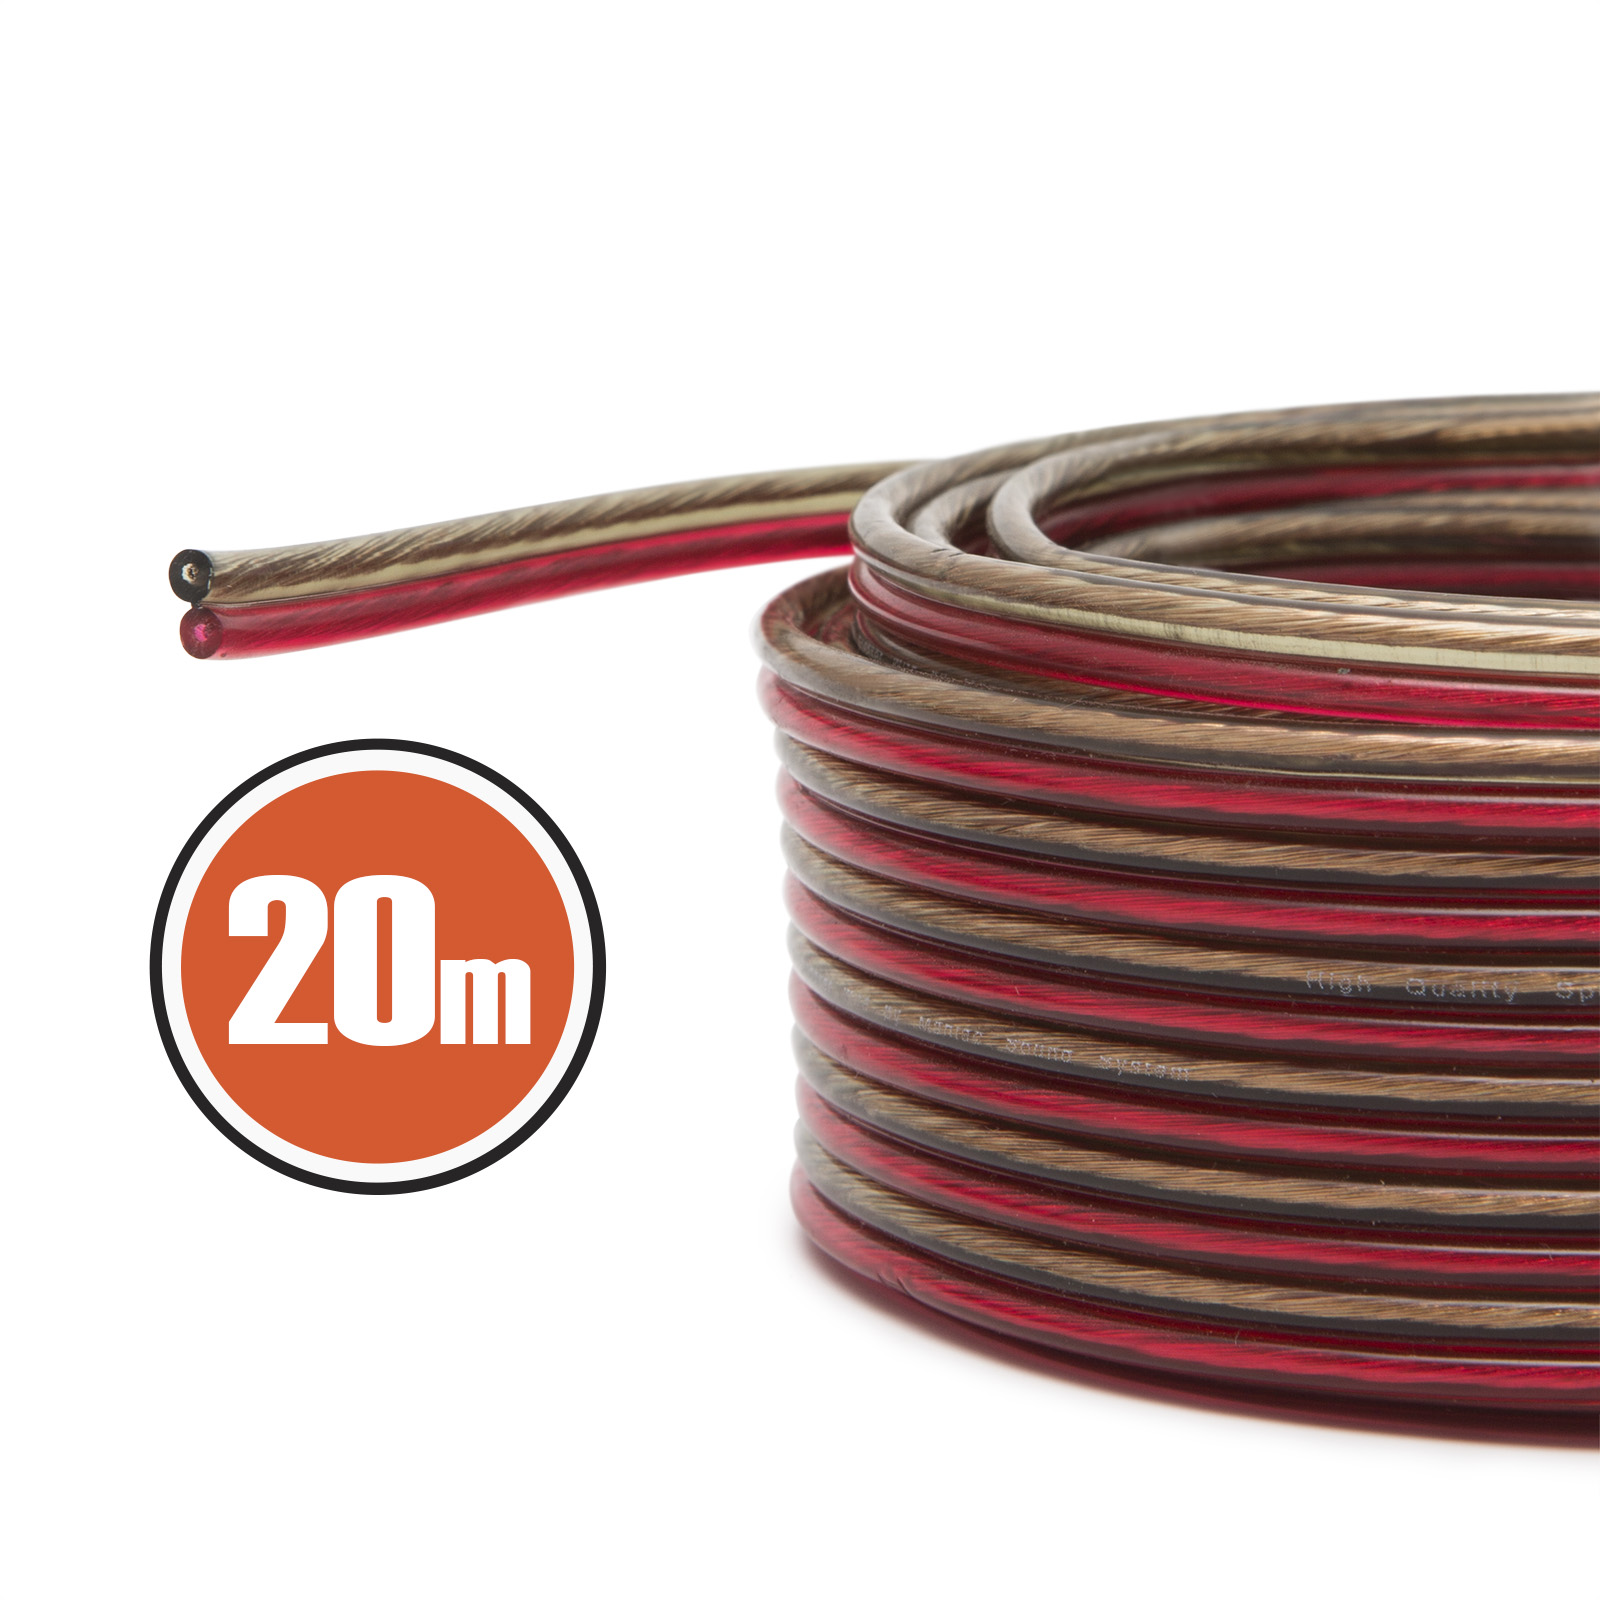 Kabel na reproduktory a reprobedny 20m Fiber Mounts KR20